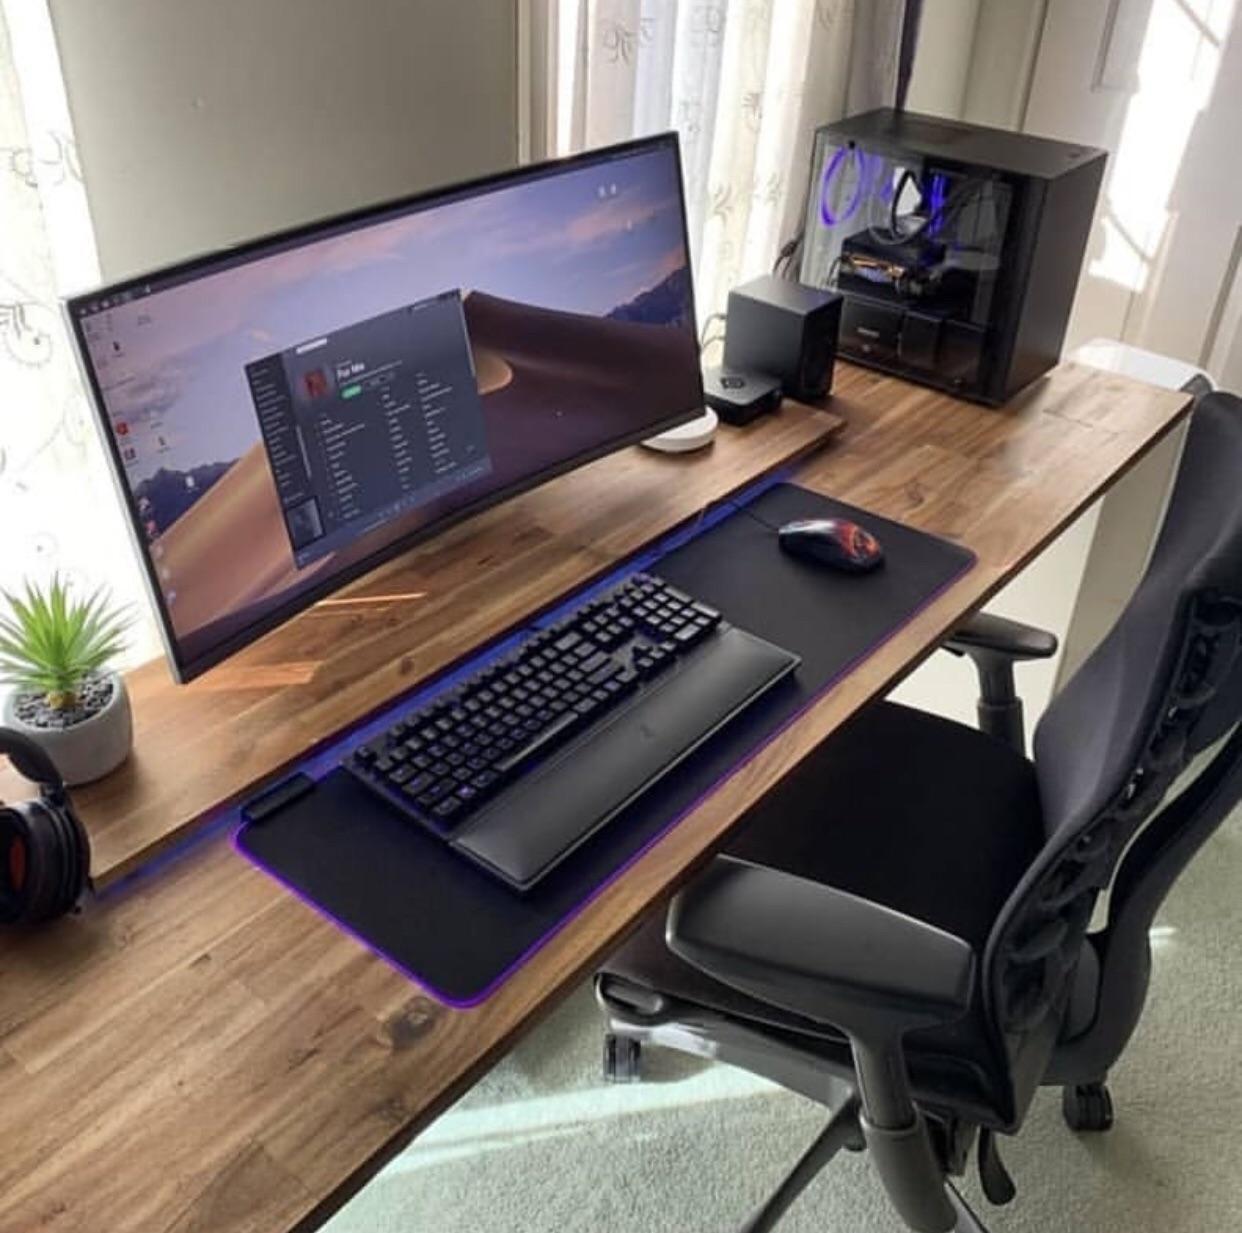 Not My Setup Whats The Desk Called Computer Desk Setup Gaming Desk Setup Best Ergonomic Office Chair